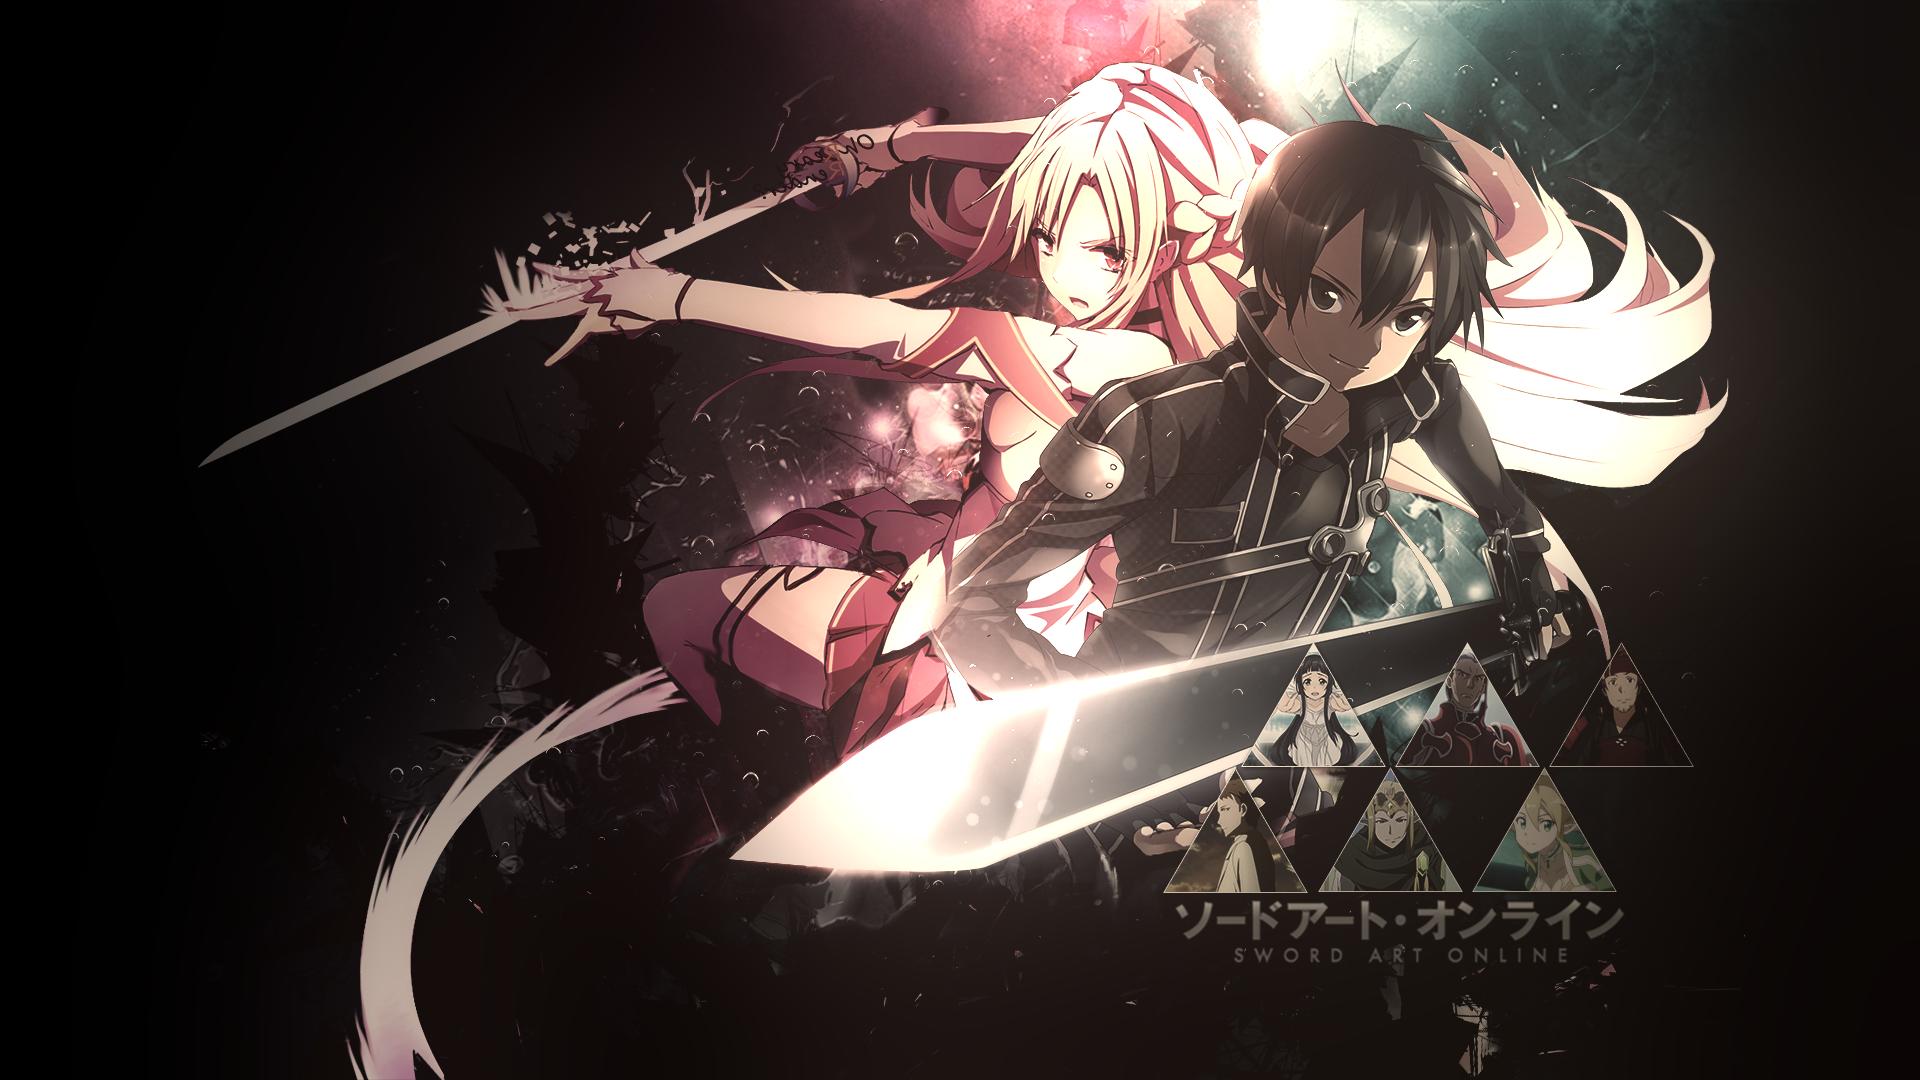 Sword Art Online Fond d'écran HD | Arrière-Plan | 1920x1080 | ID:603257 - Wallpaper Abyss